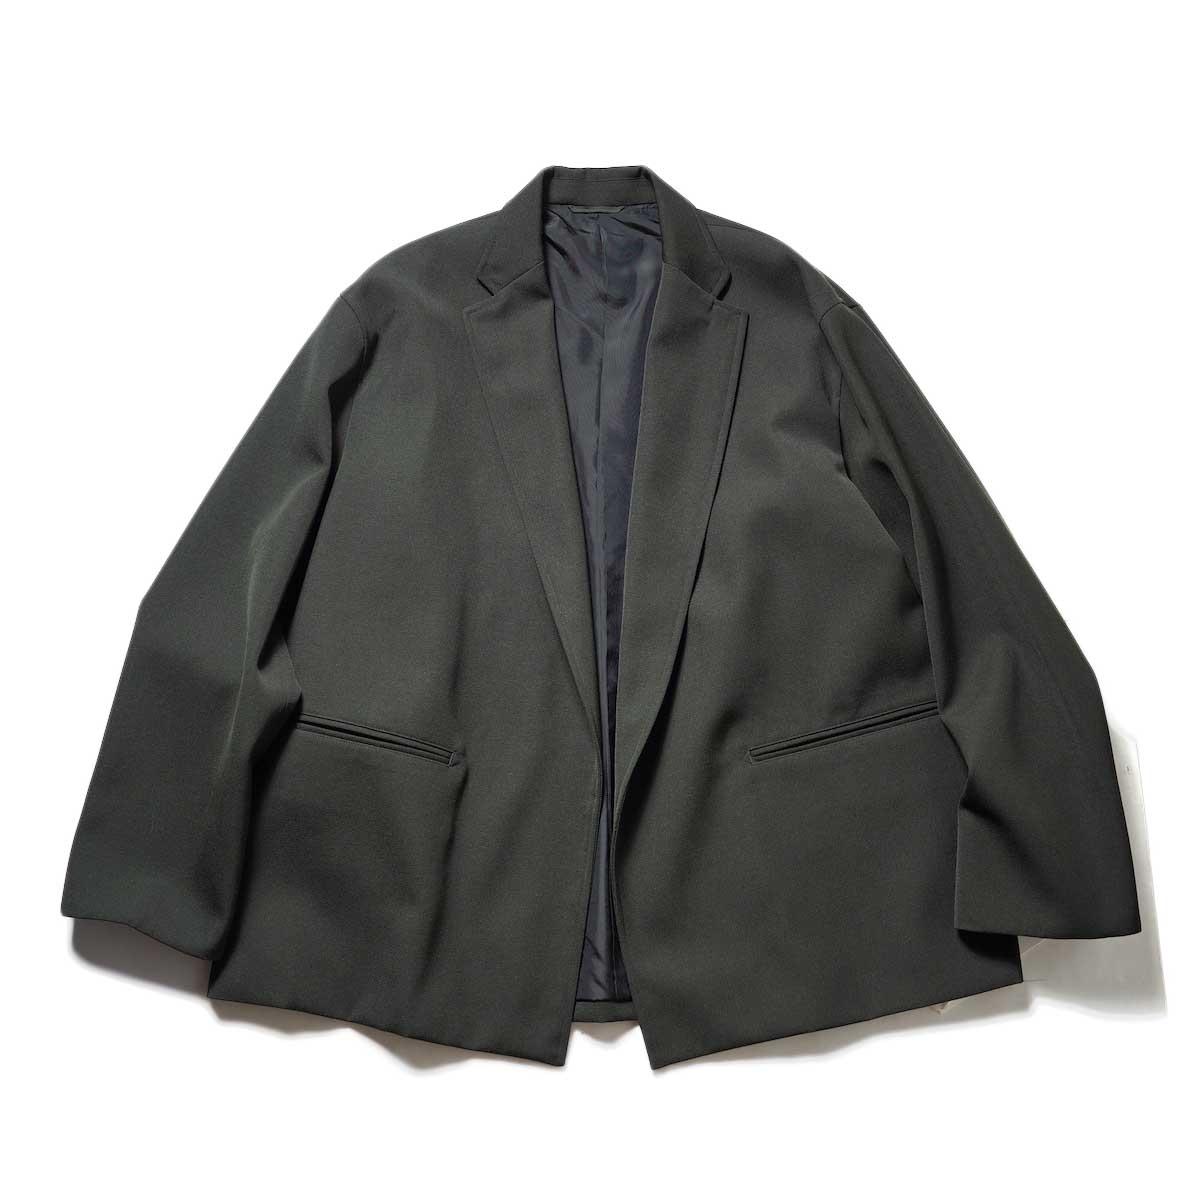 blurhms / Wool Surge Cardigan Jacket (Khaki Grey)